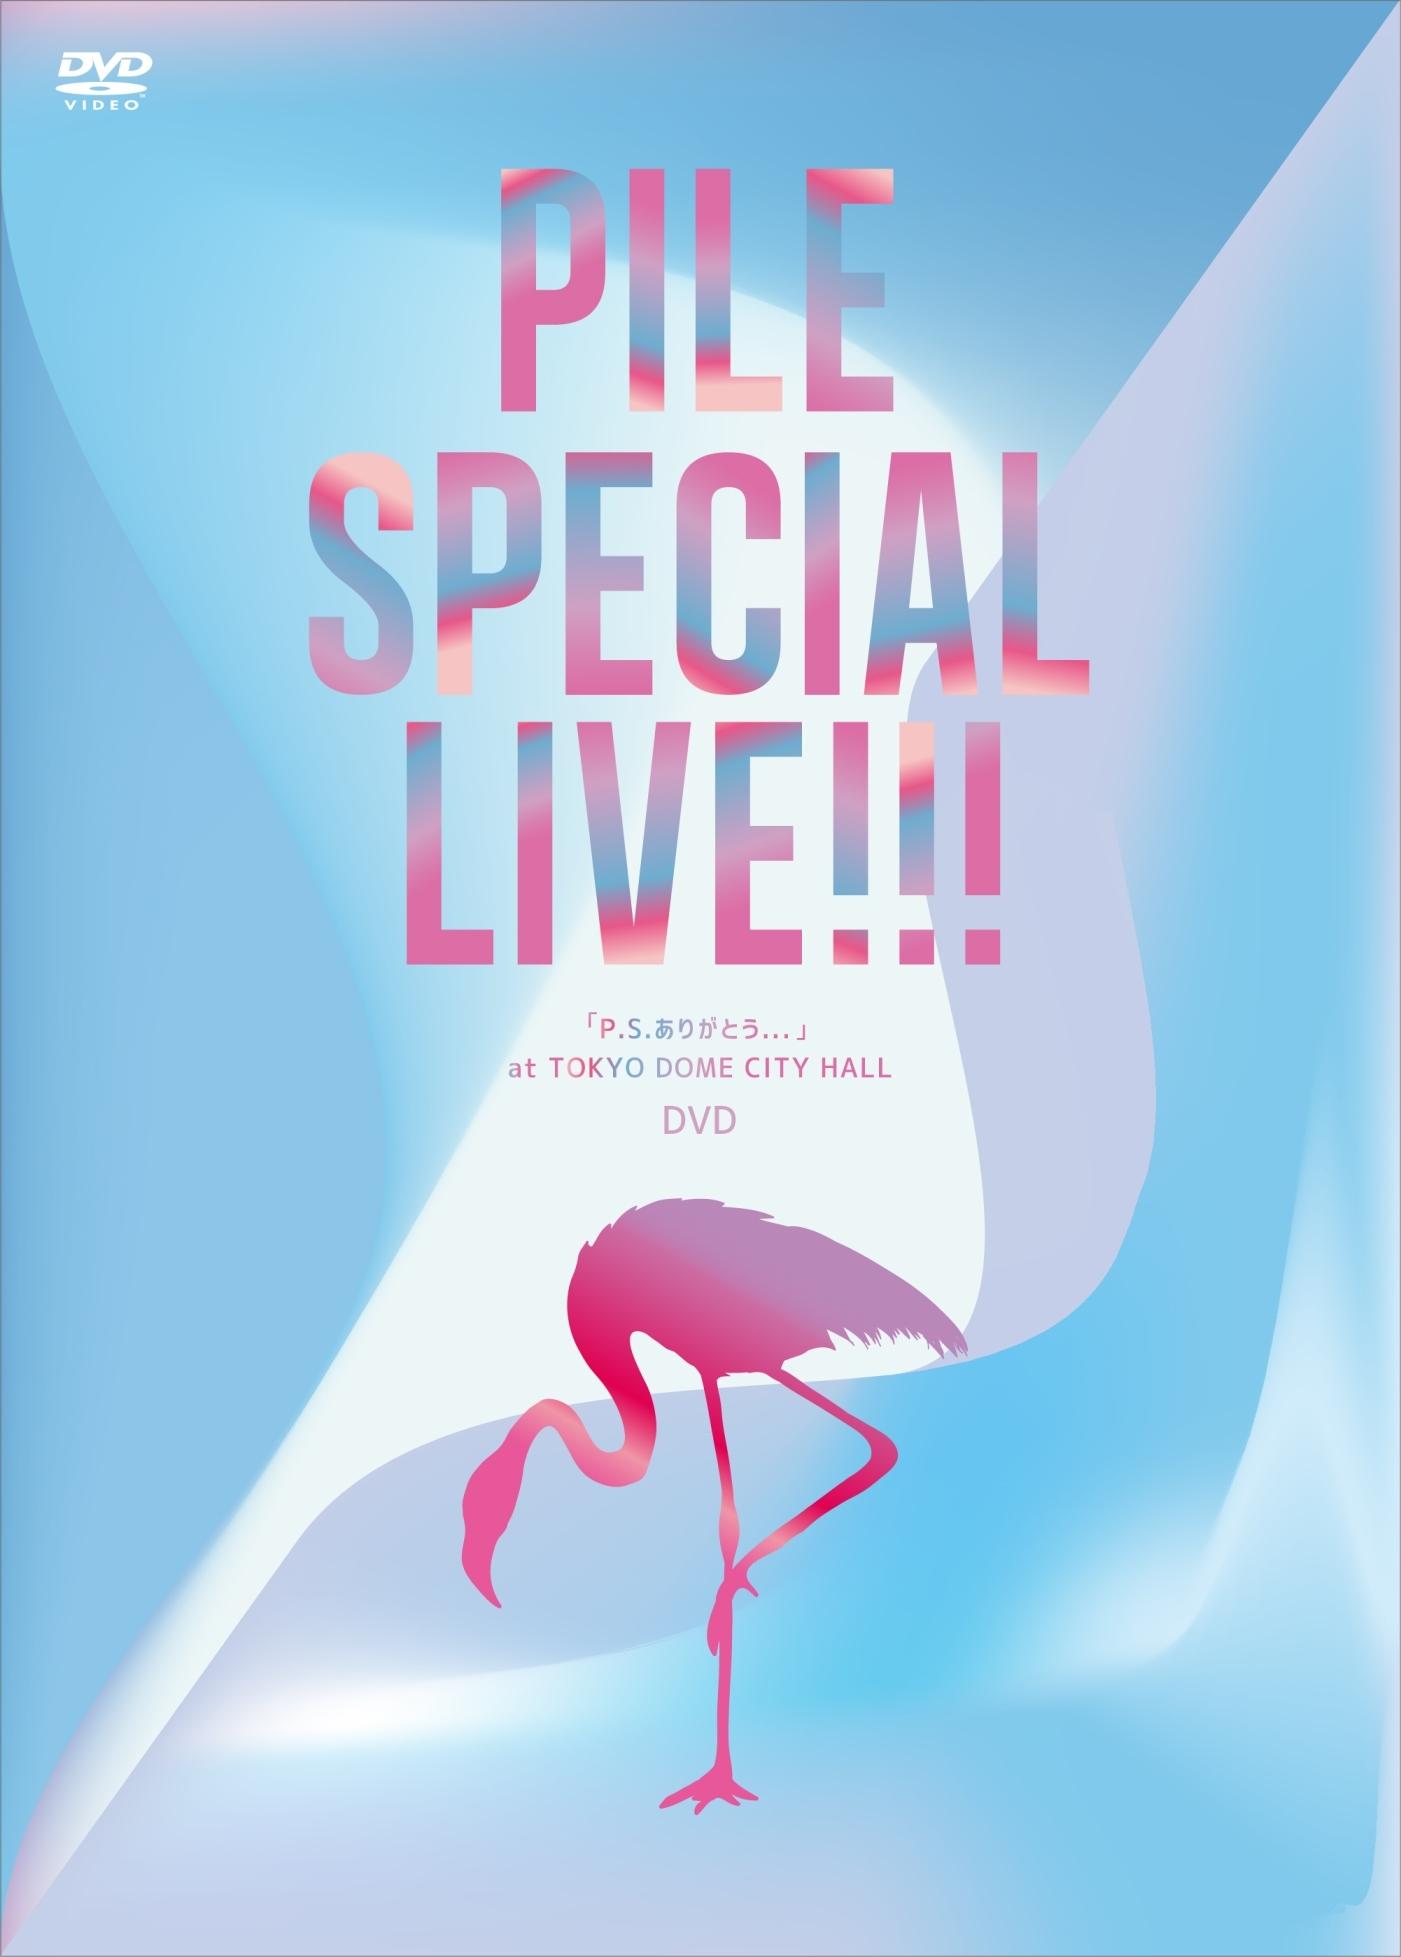 Pile DVD